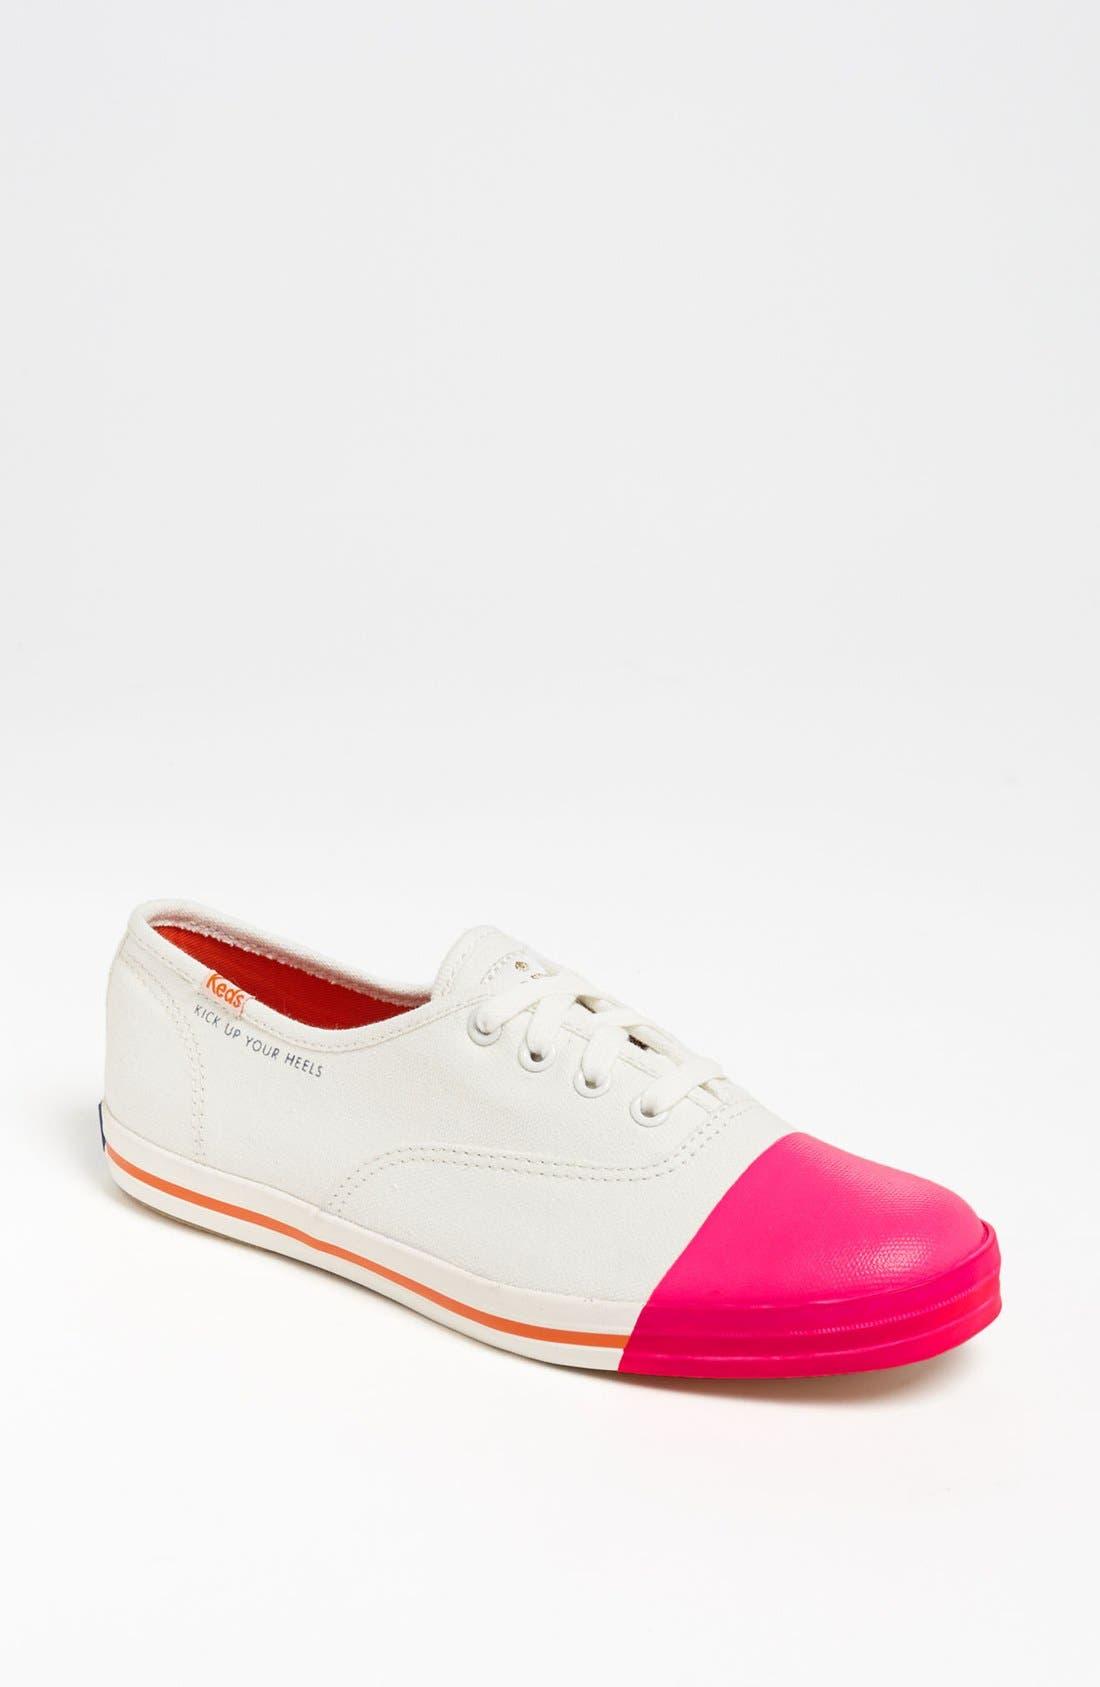 Keds<sup>®</sup> for kate spade new york 'kick' sneaker,                             Main thumbnail 3, color,